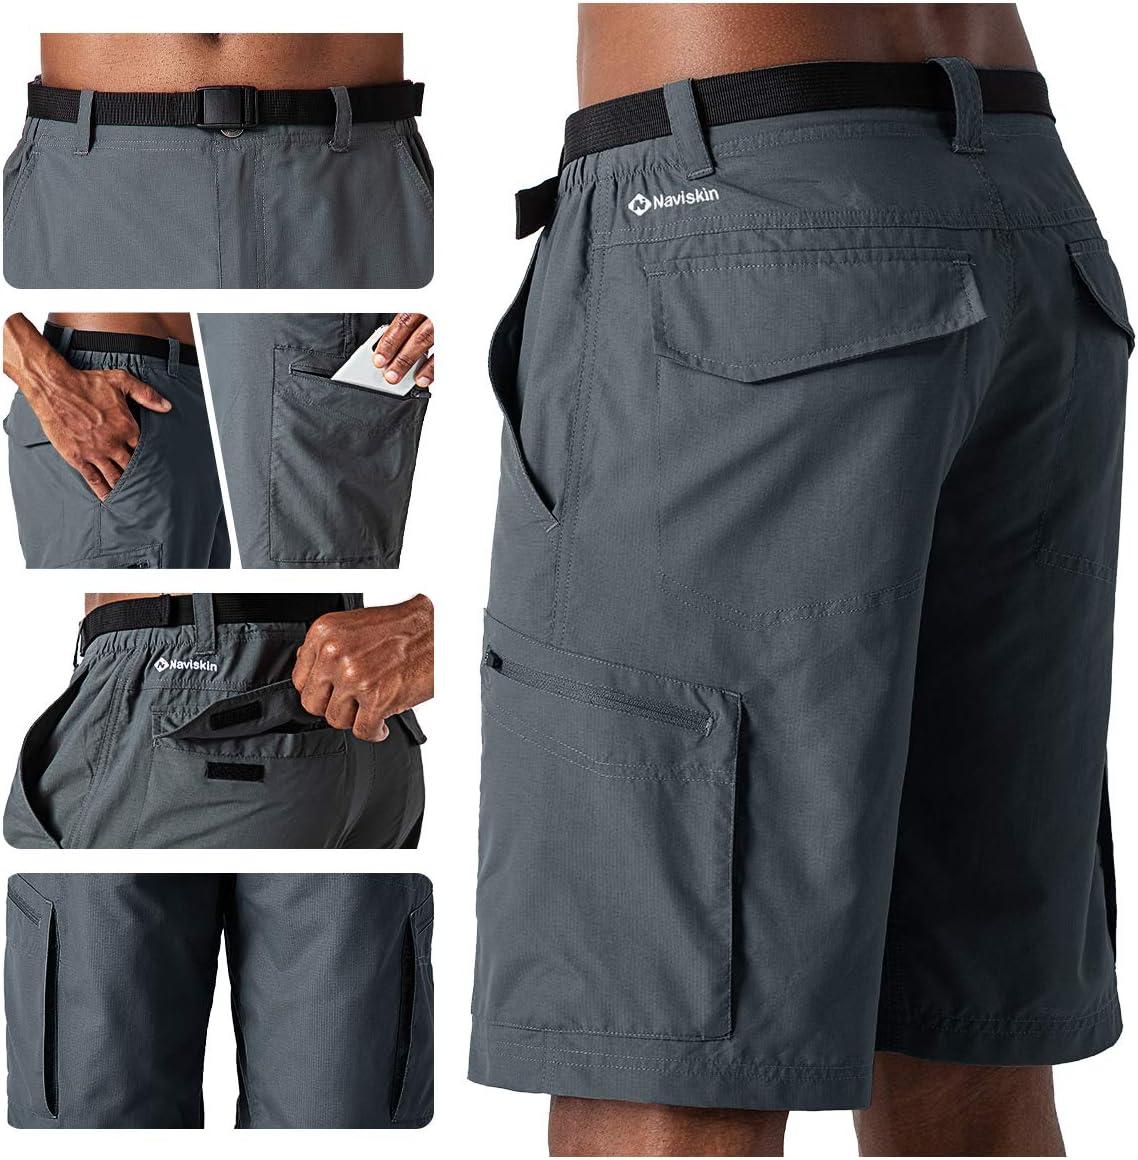 Nailon Ligero Secado R/ápido Pantal/ón de T/érmica Acampada Campismo Marcha NAVISKIN Pantalones Cortos de Senderismo UPF 50 para Hombre